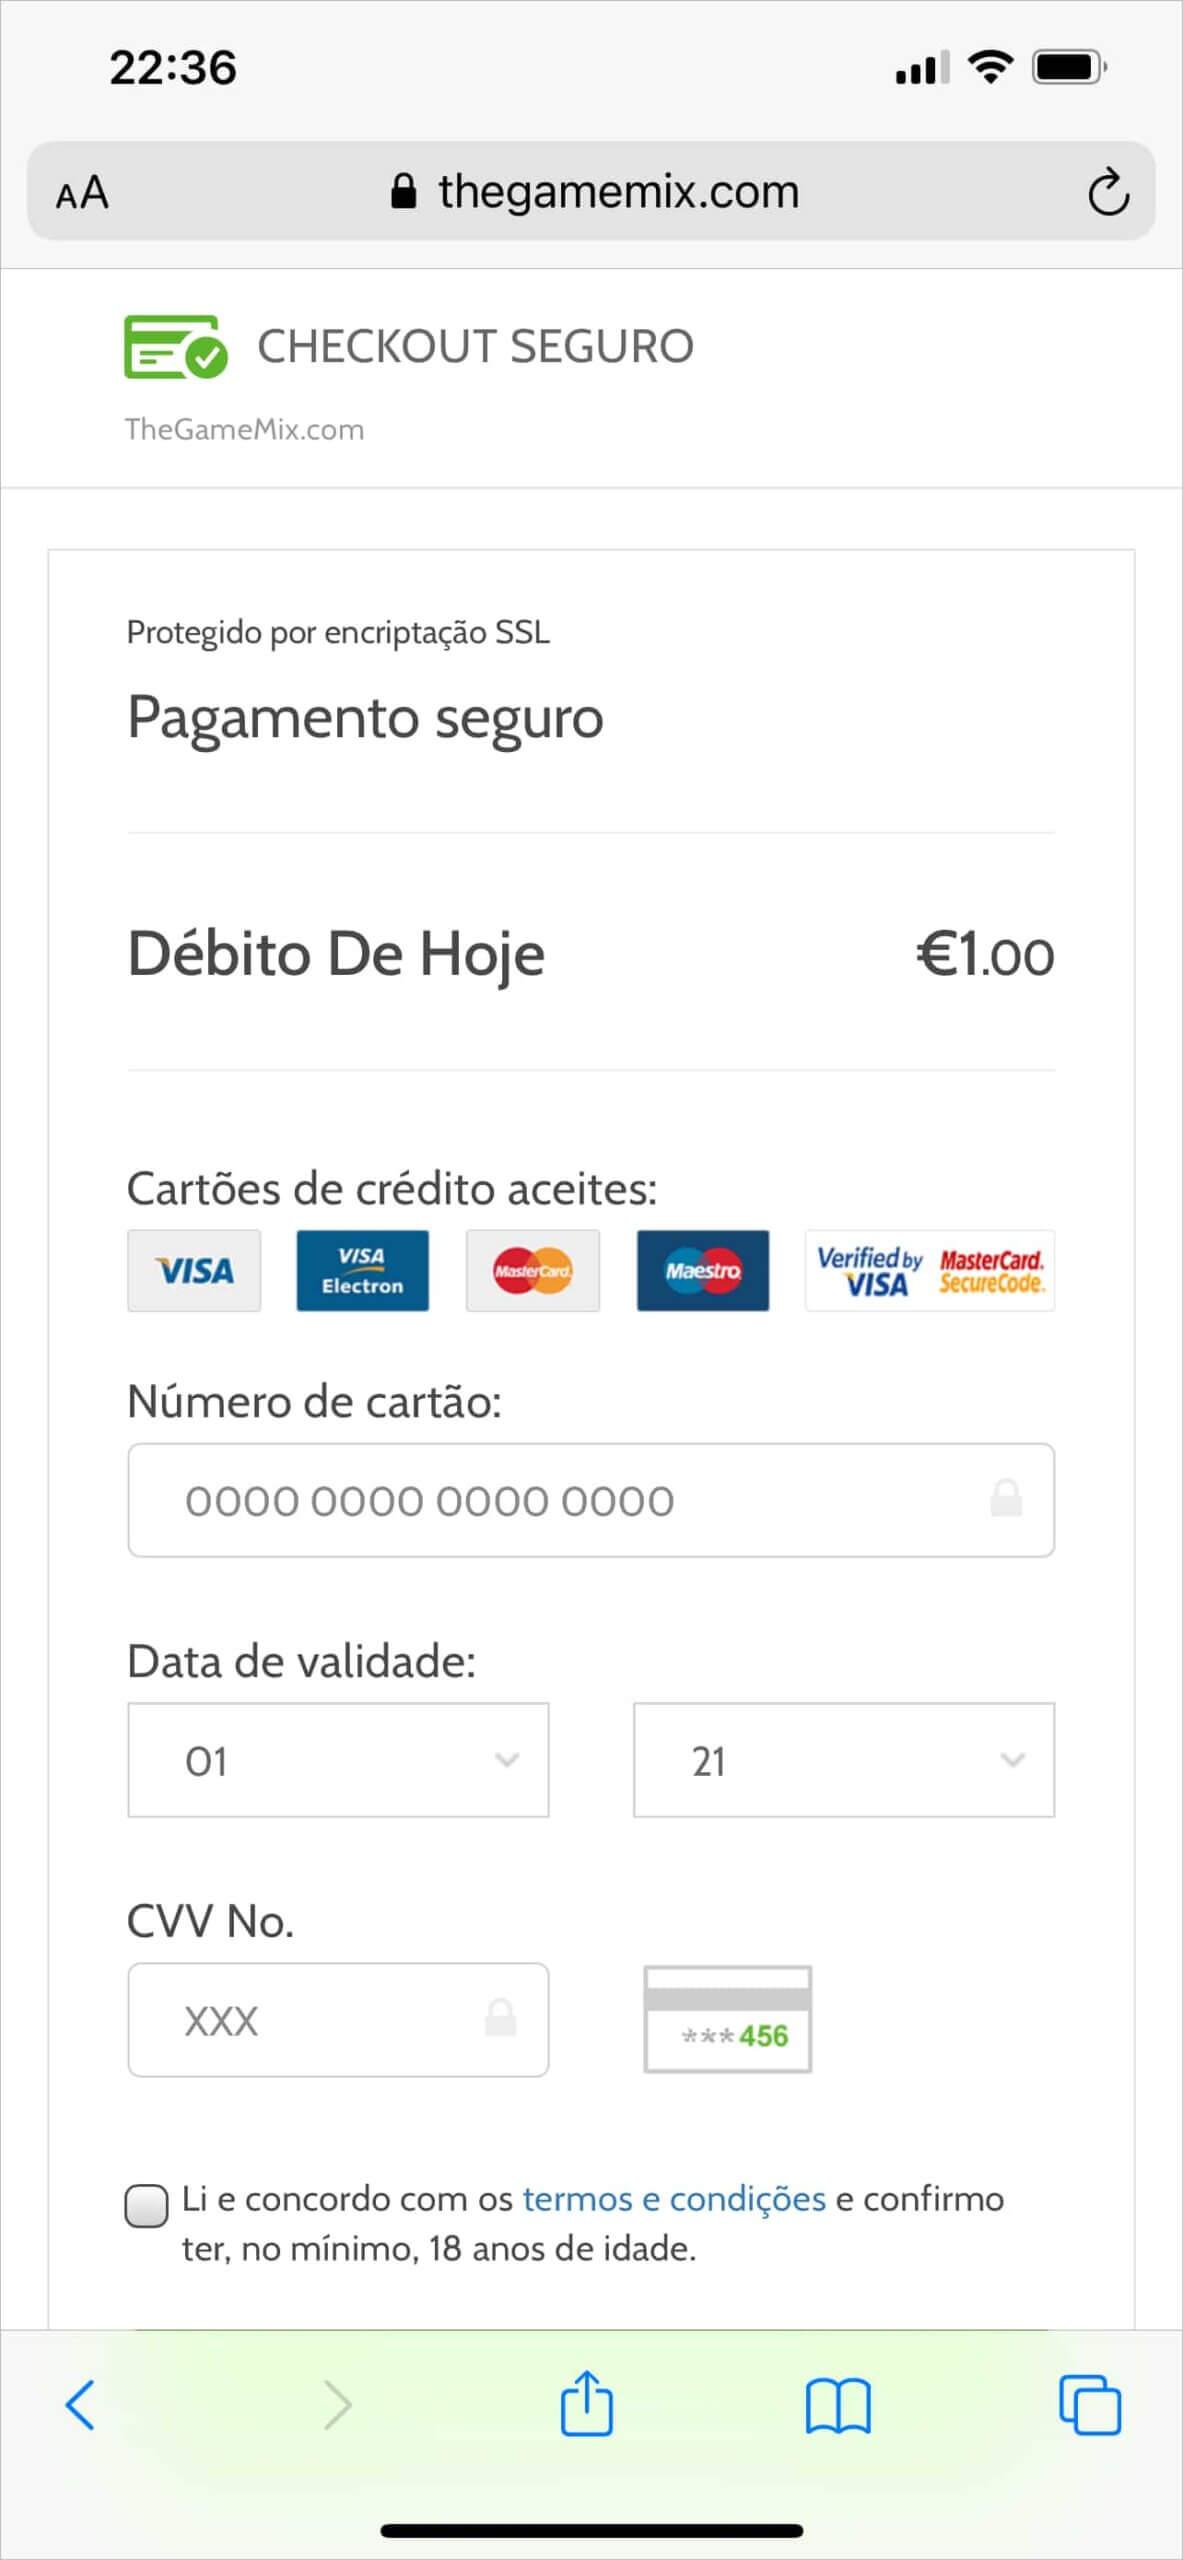 03portal_das_finanças_phishing_netsegura